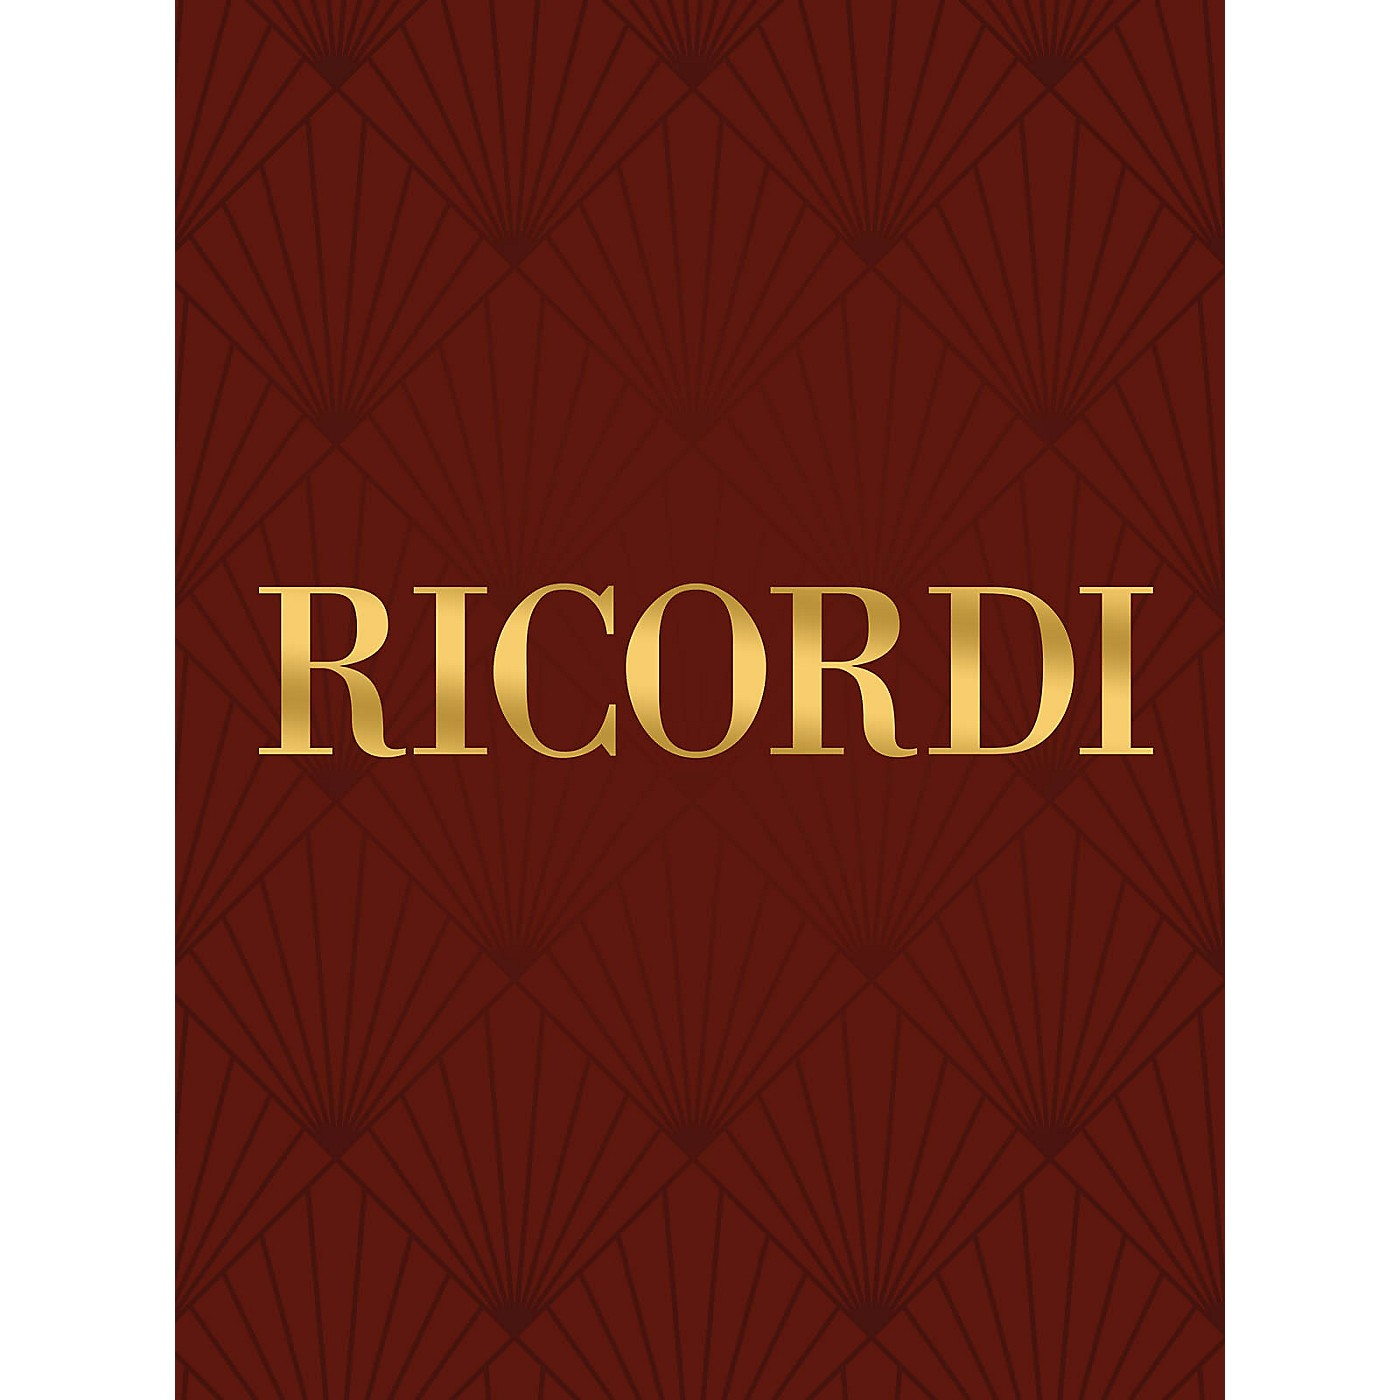 Hal Leonard I Capuleti e I Montecchi (Piano/Vocal Score Reduction Based on the Critical Edition) by Vincenzo Bellini thumbnail